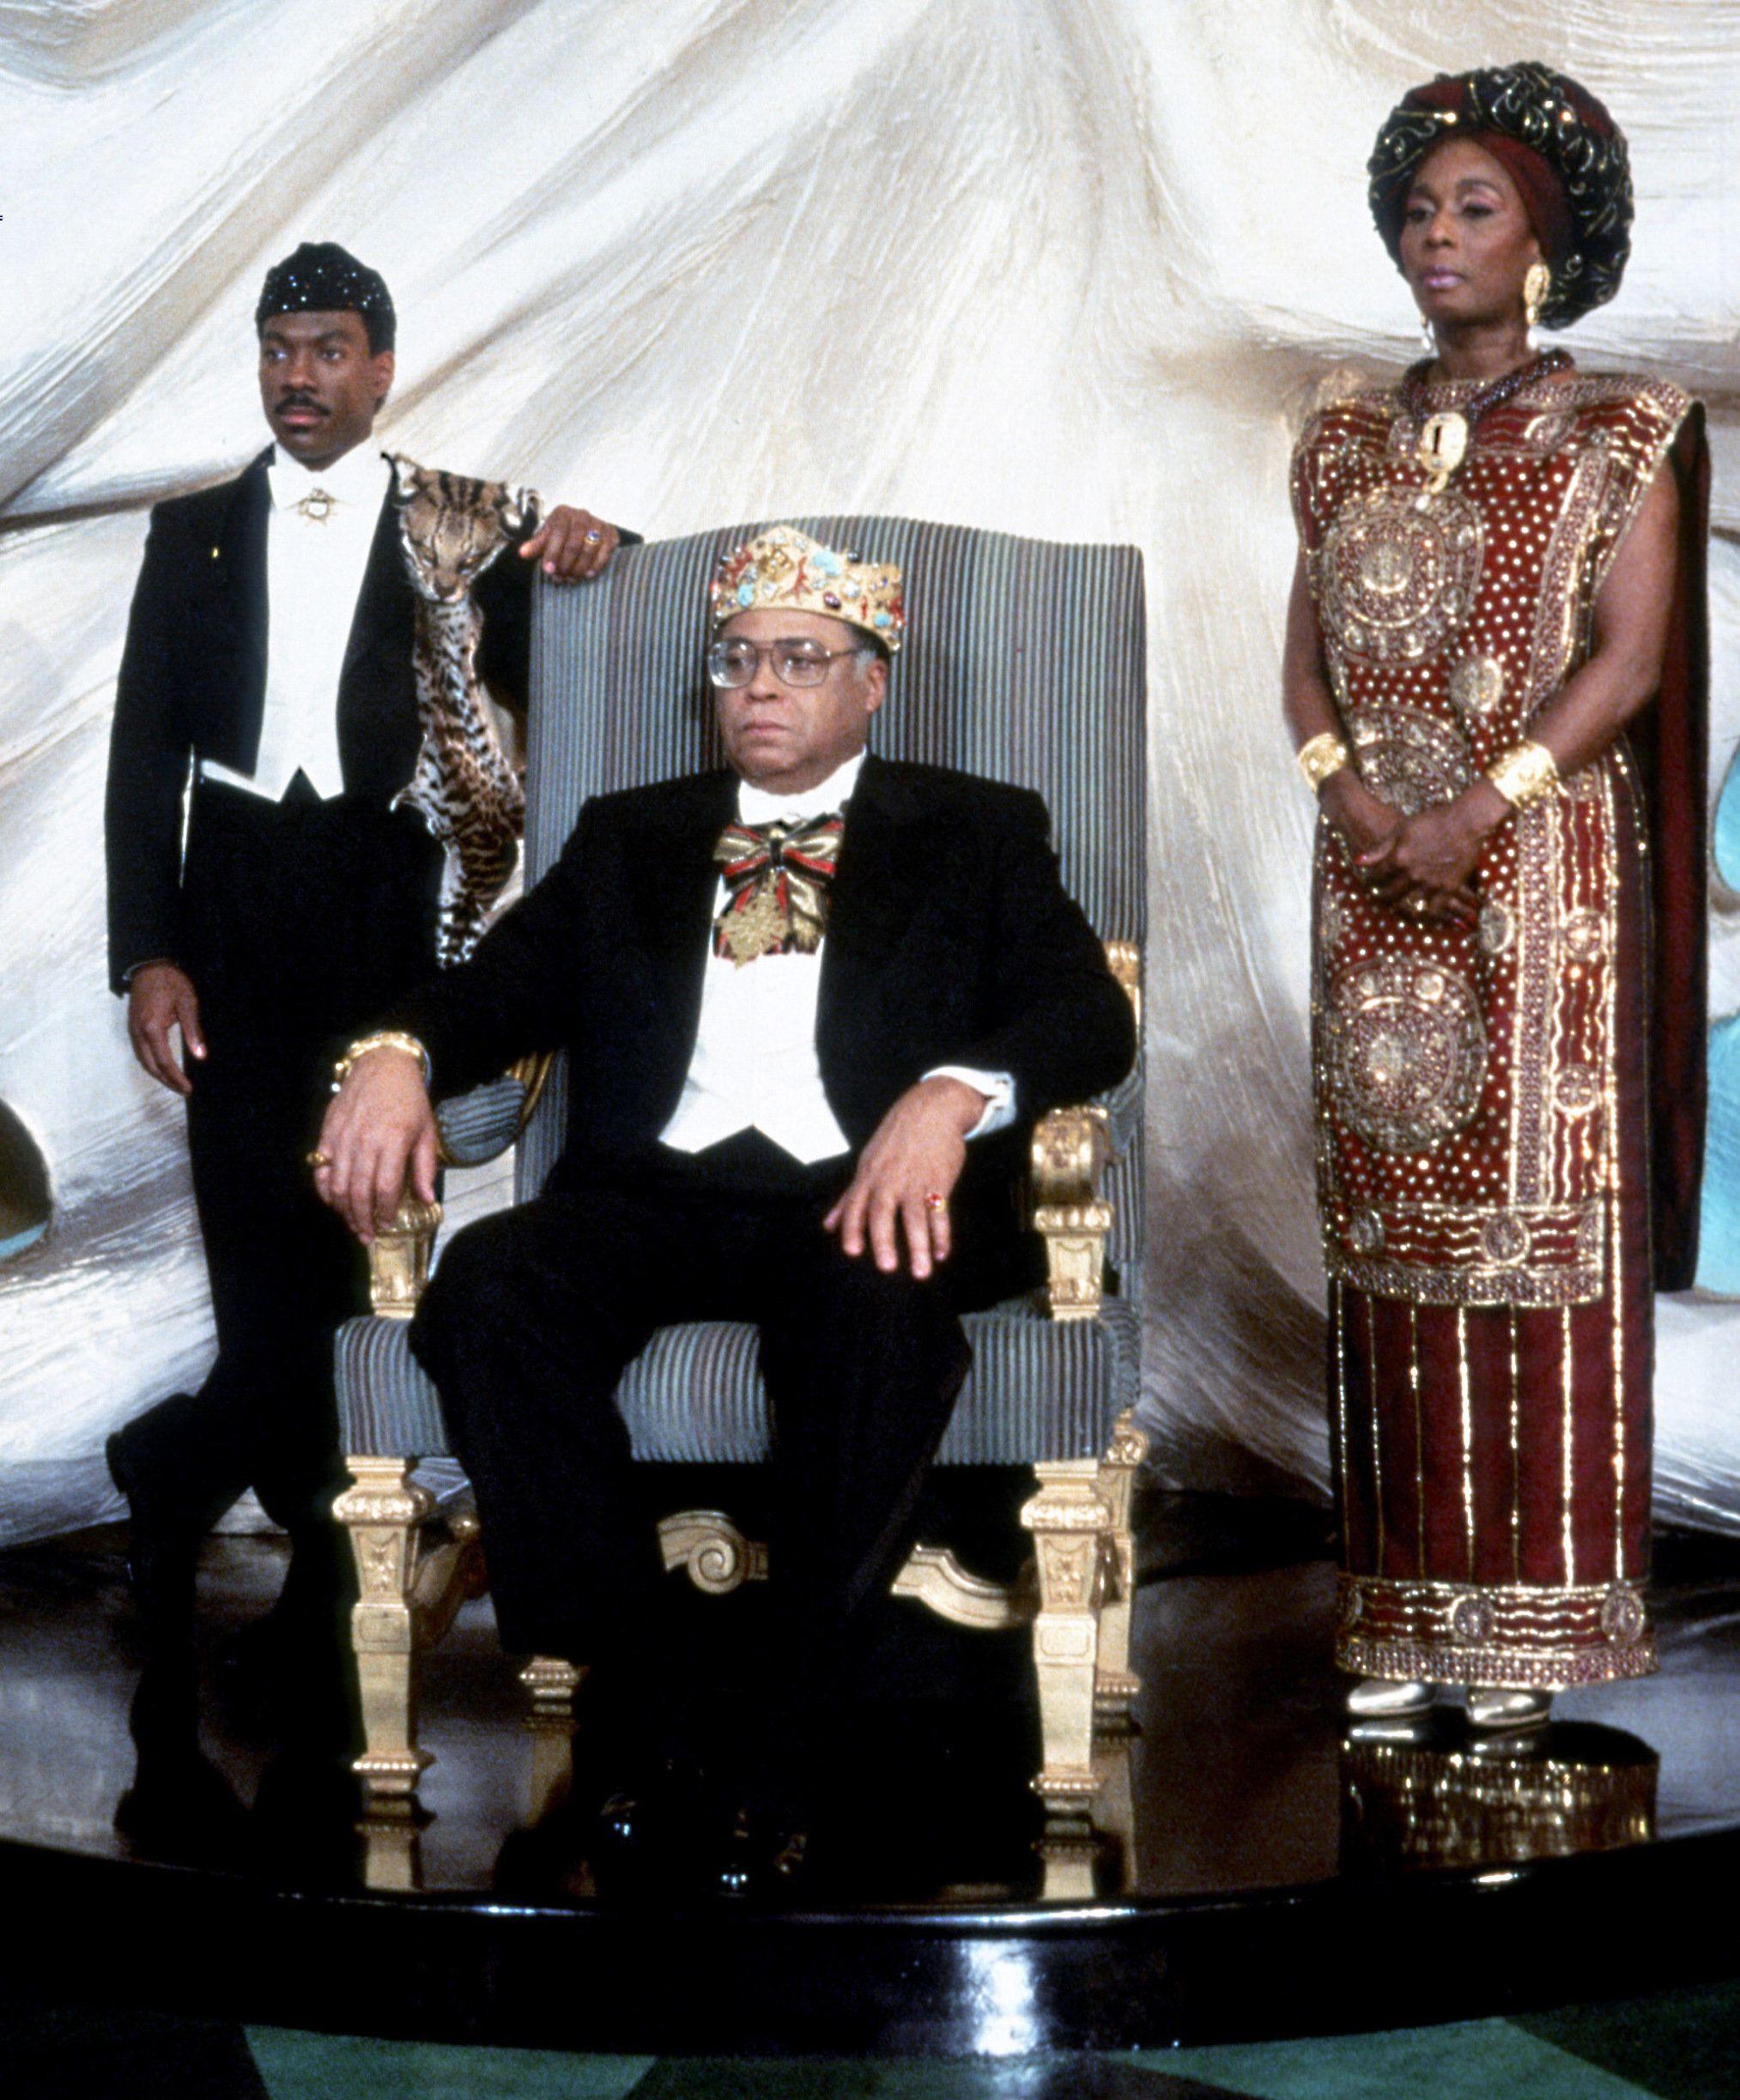 Prince Akeem, King Jaffe, and Queen Aoleon \u200b